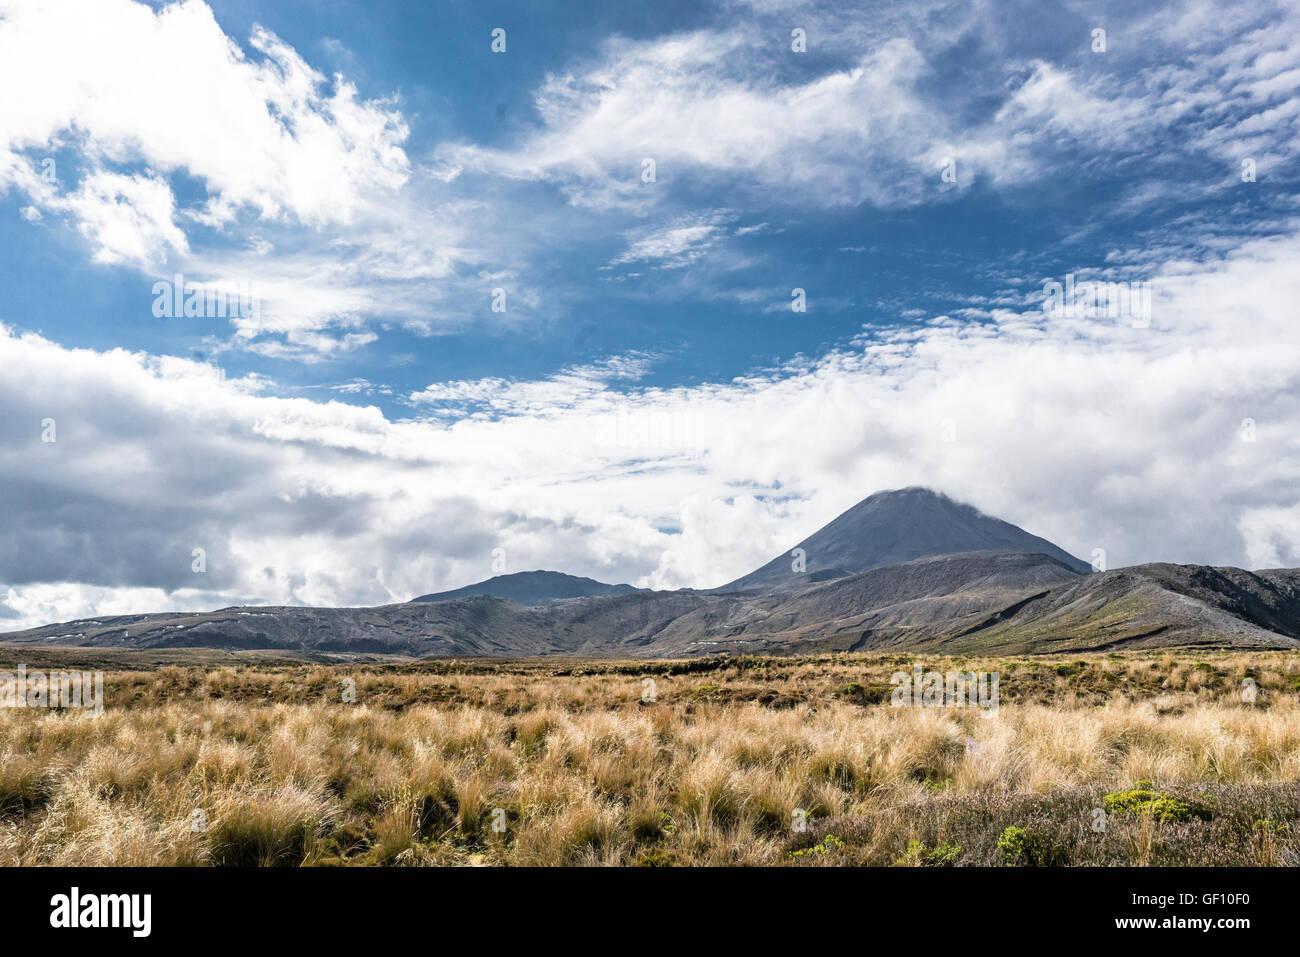 Tongariro National Park, New Zealand - Stock Image